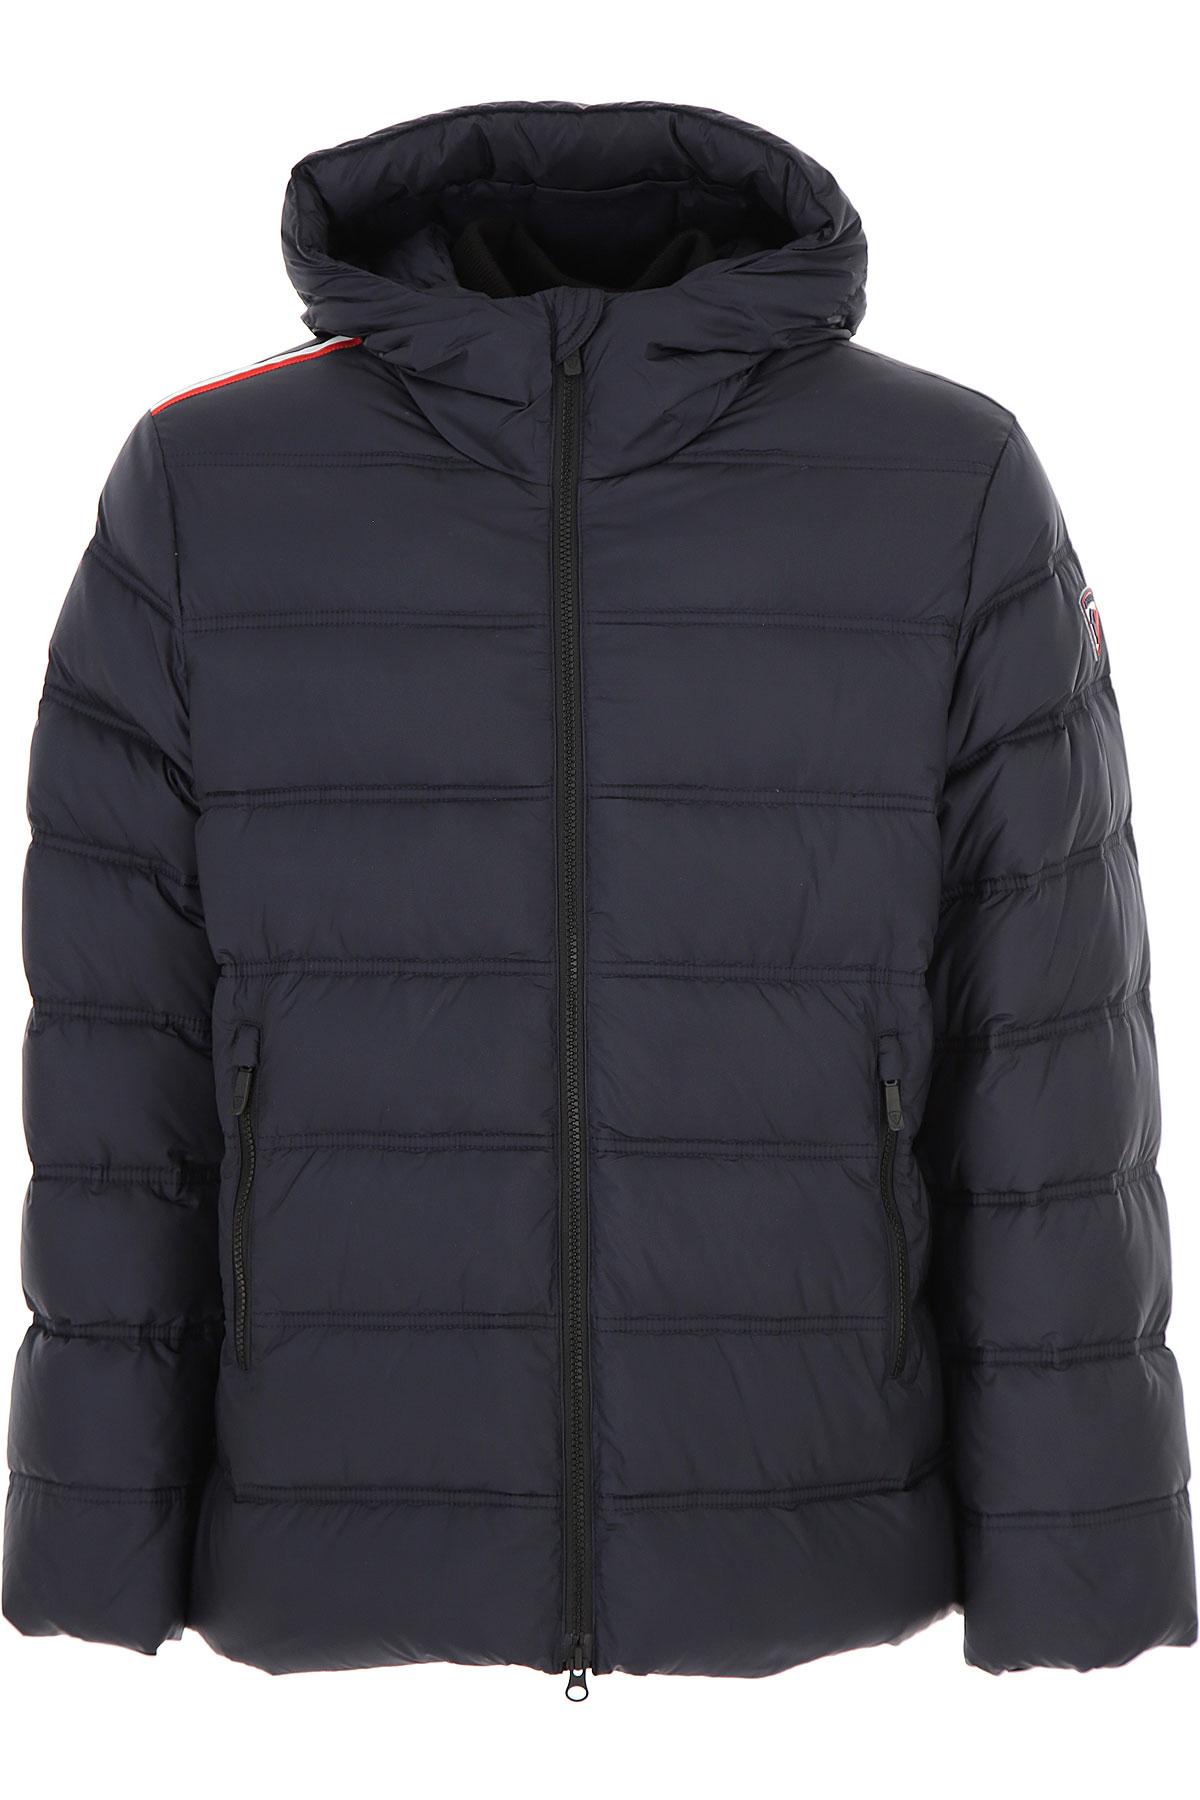 Rossignol Down Jacket for Men, Puffer Ski Jacket On Sale, Eclipse Blue, polyester, 2019, M S XL